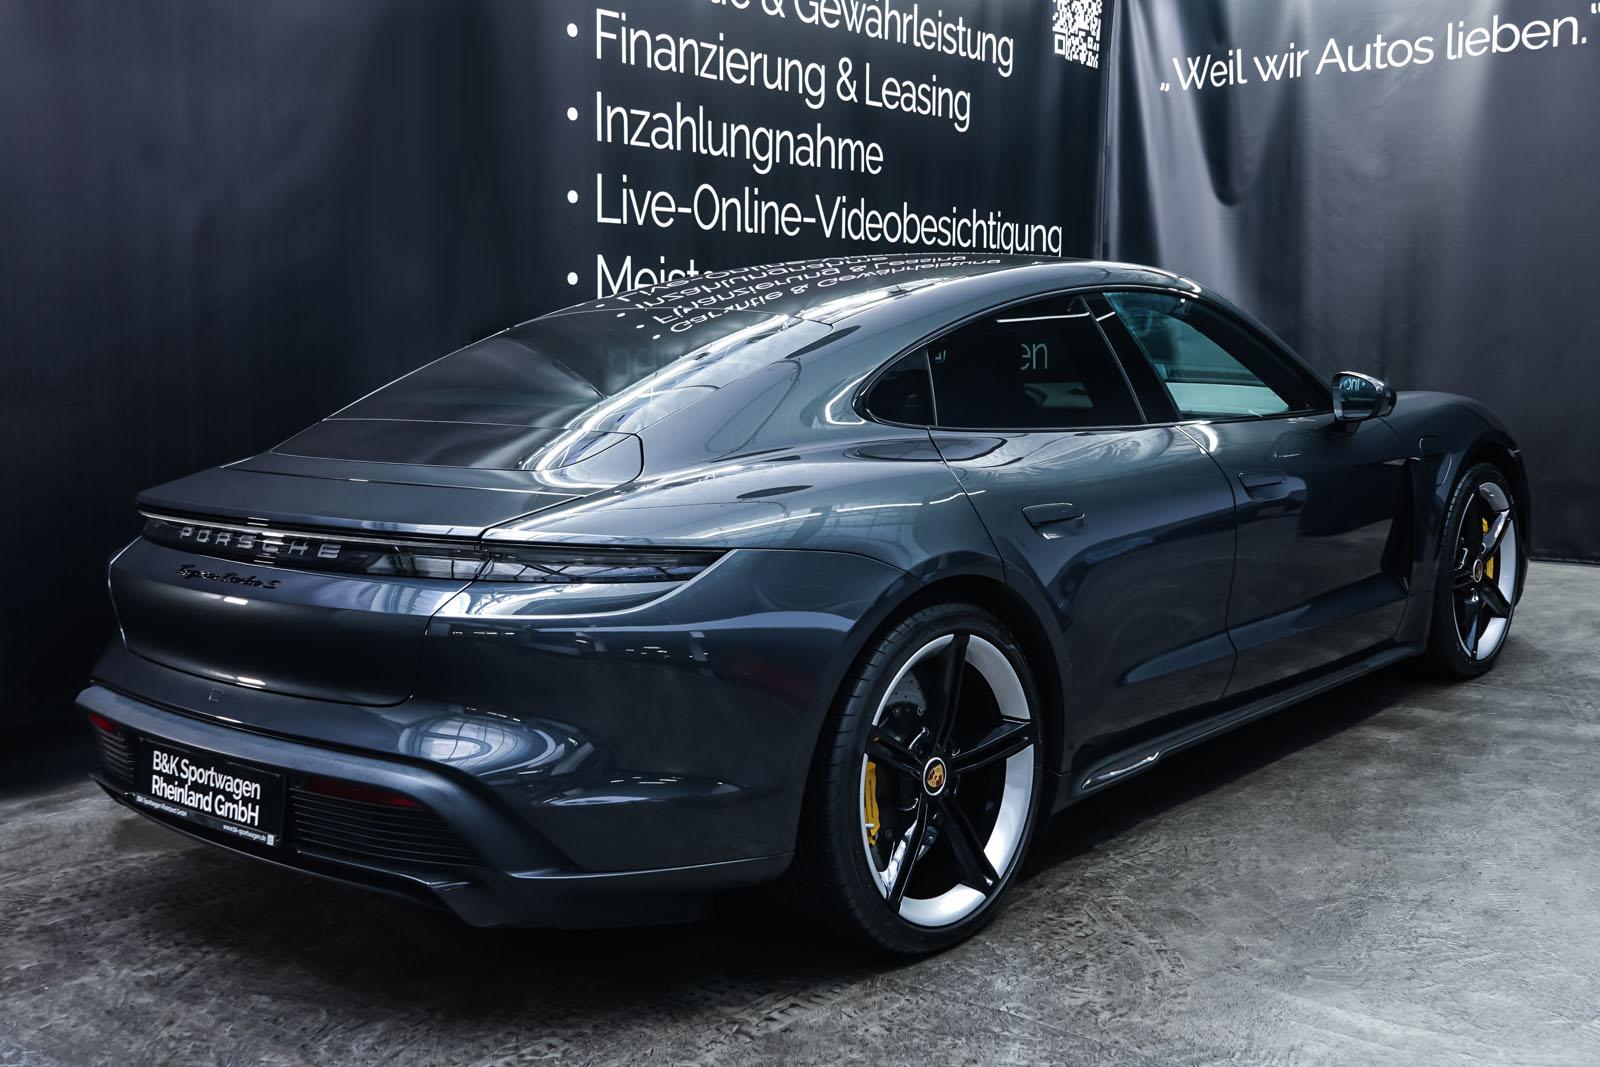 Porsche_Taycan_TurboS_Grau_Schwarz_POR-5353_16_w